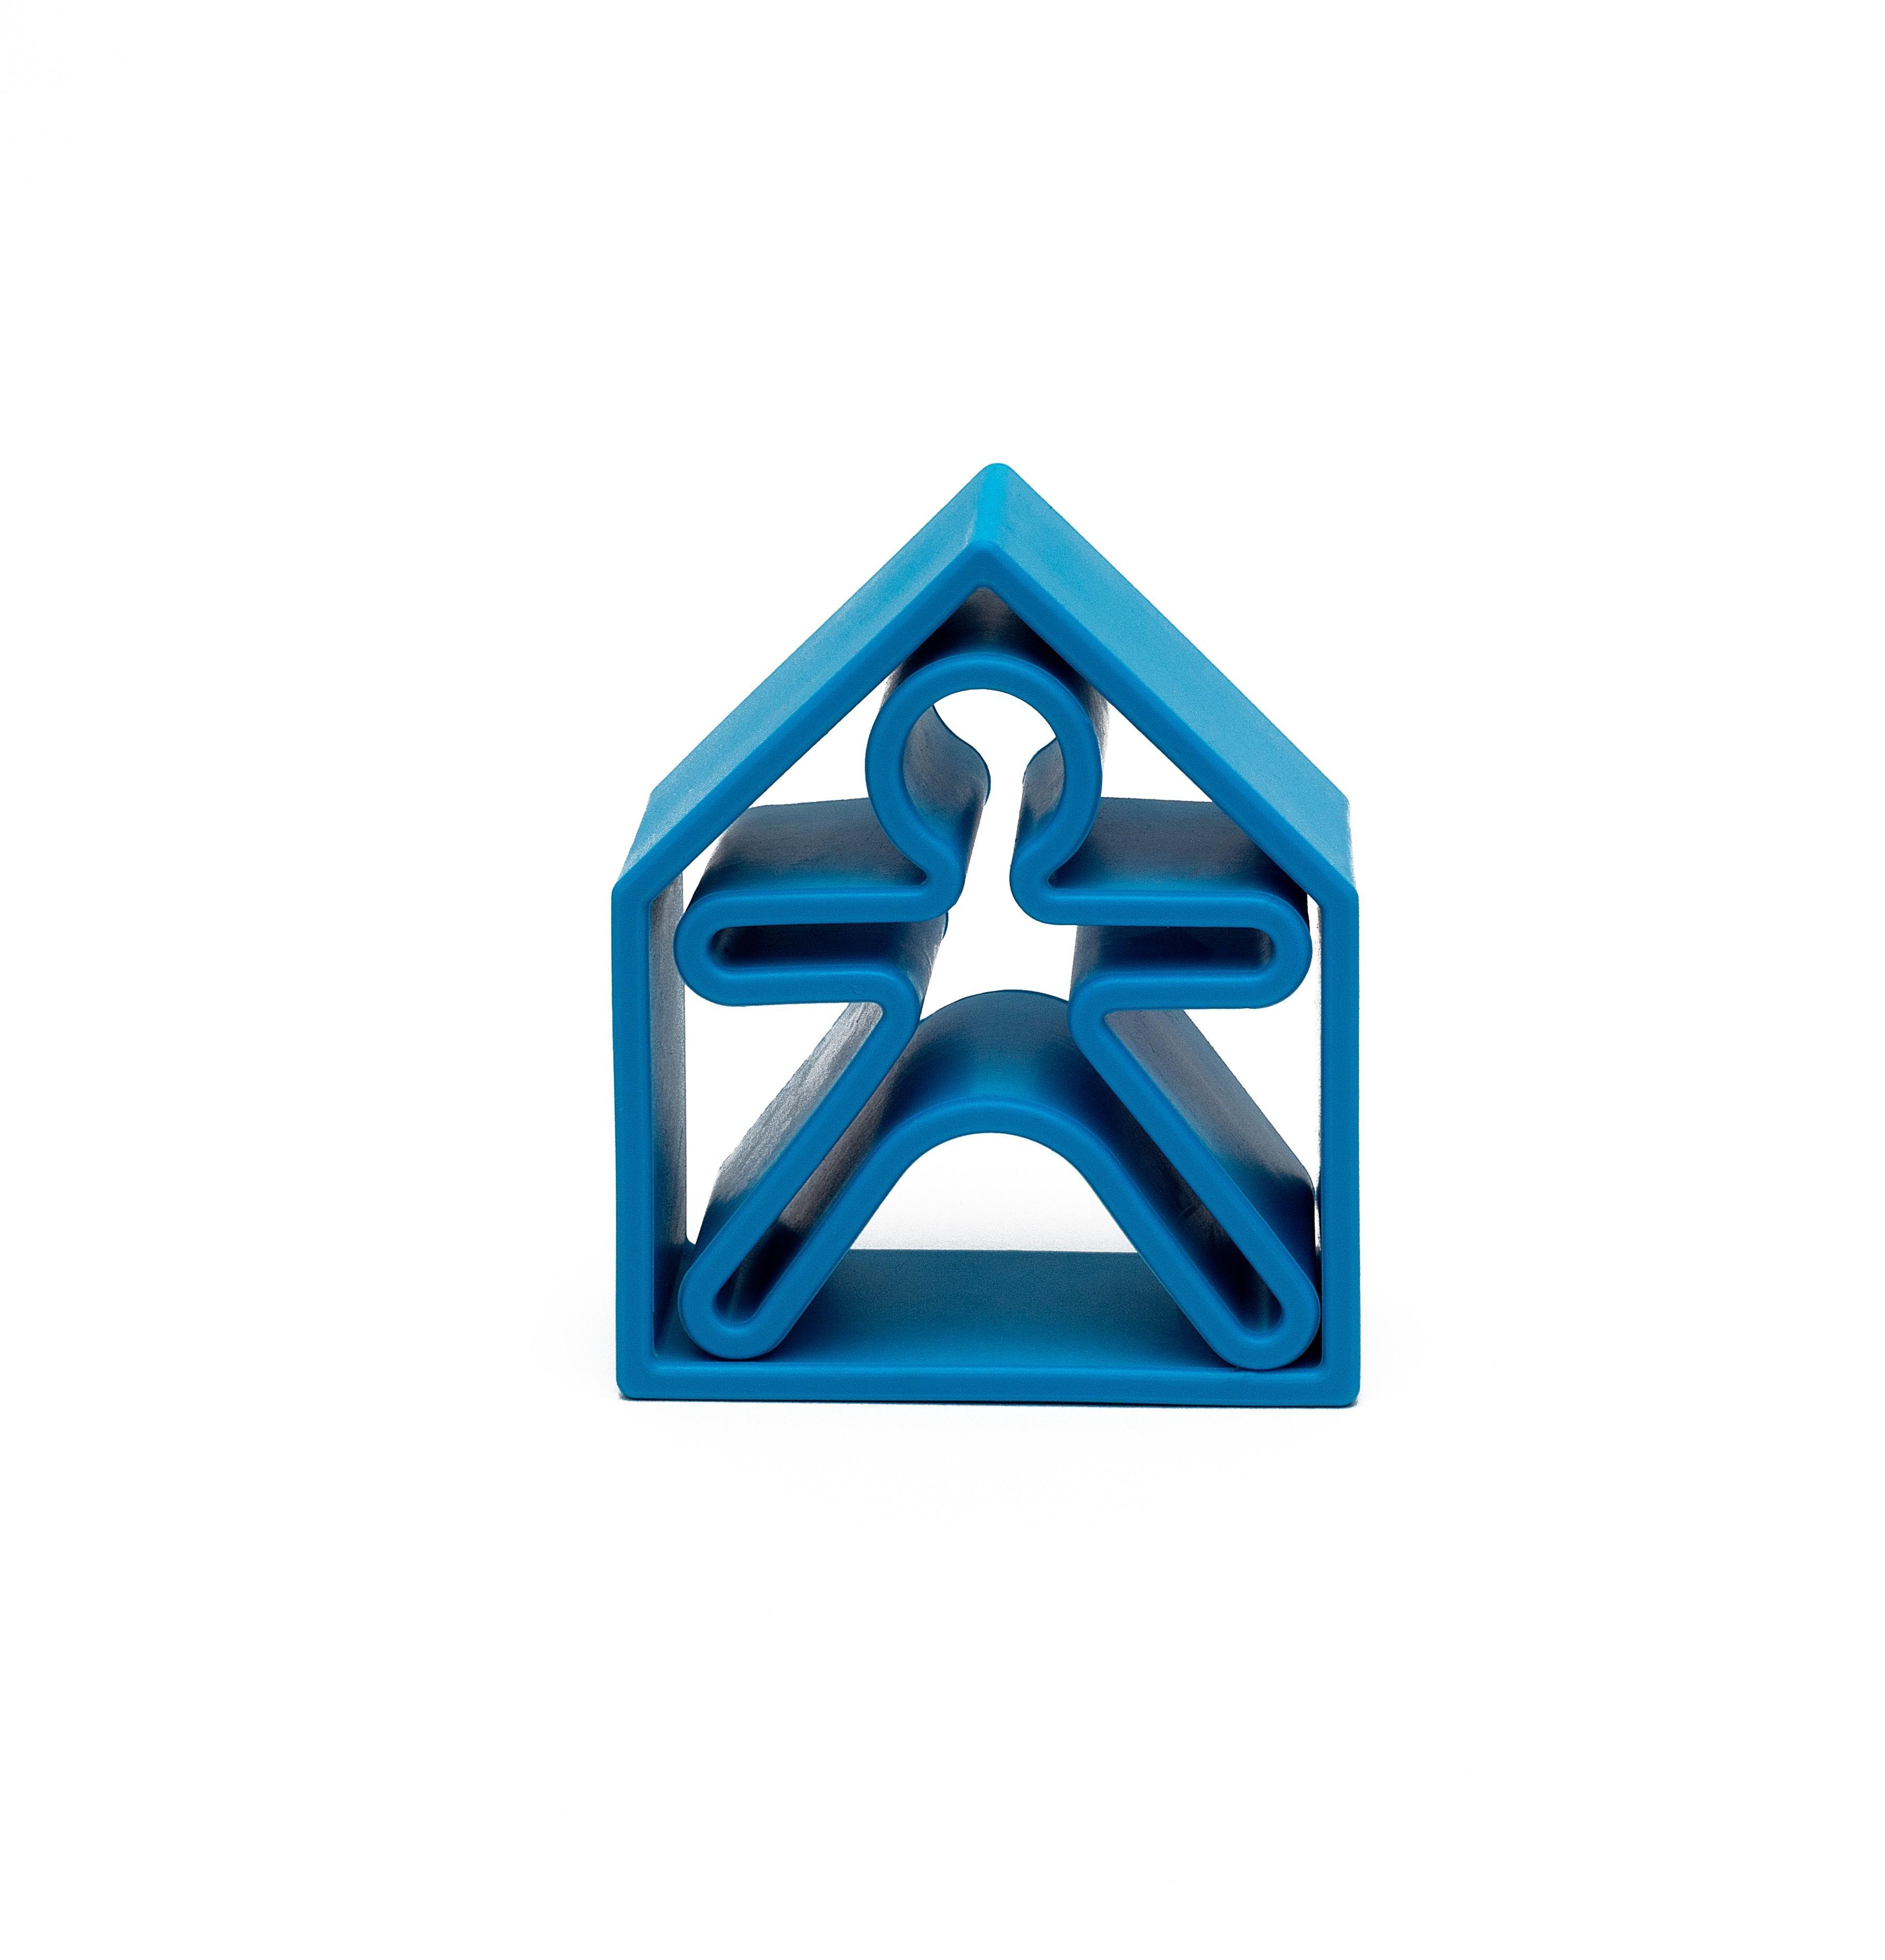 Dena - 1 Kid + 1 House Blue Neon